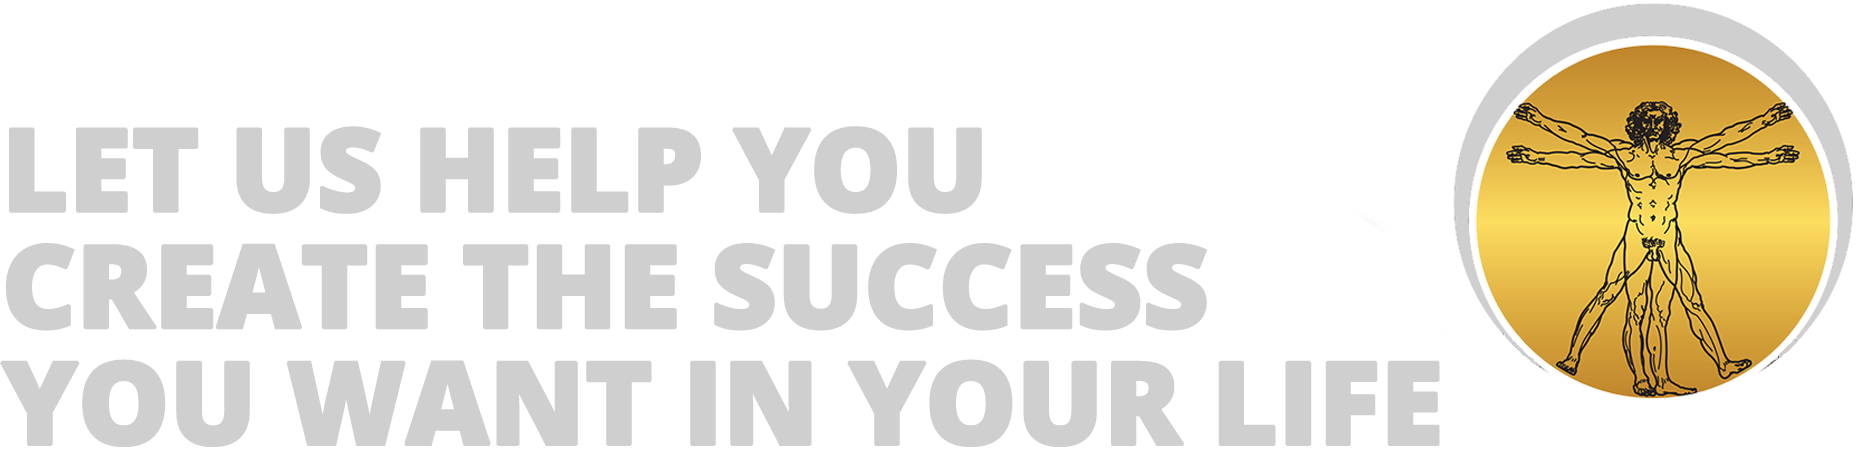 Referral Partner Success System